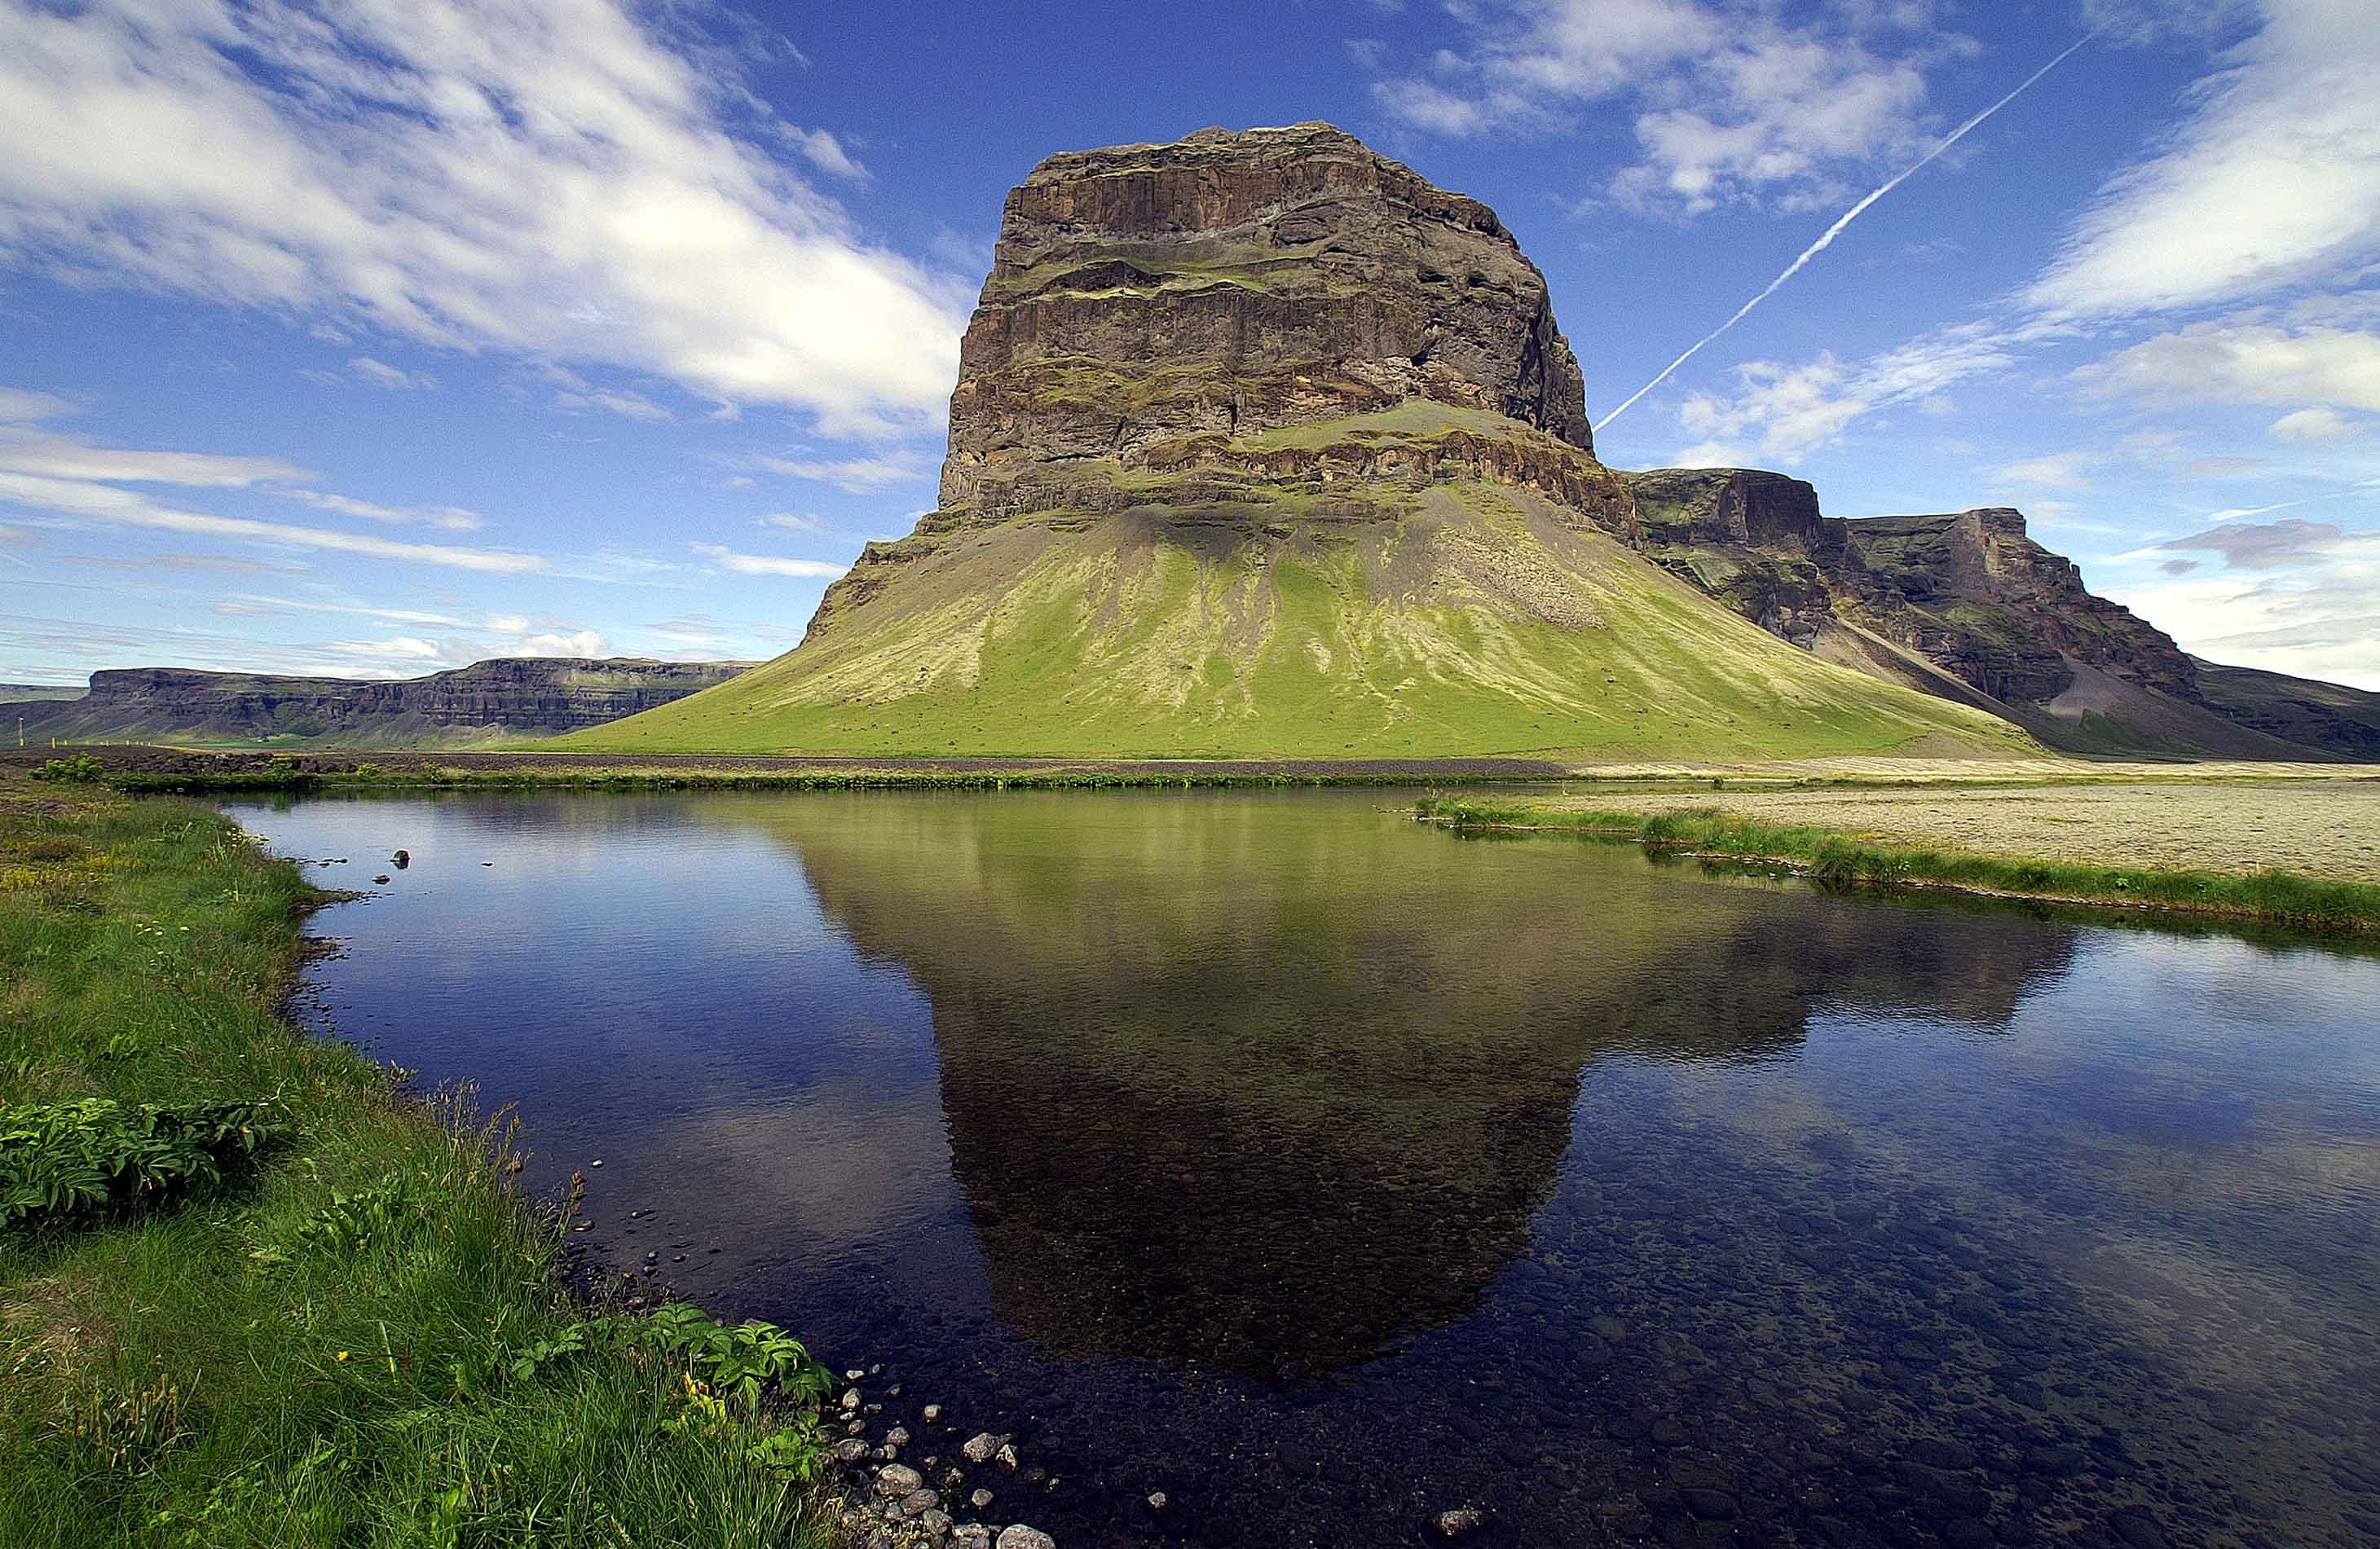 Casas para turistas isl ndia quer restringir neg cio idealista news - Casas en islandia ...